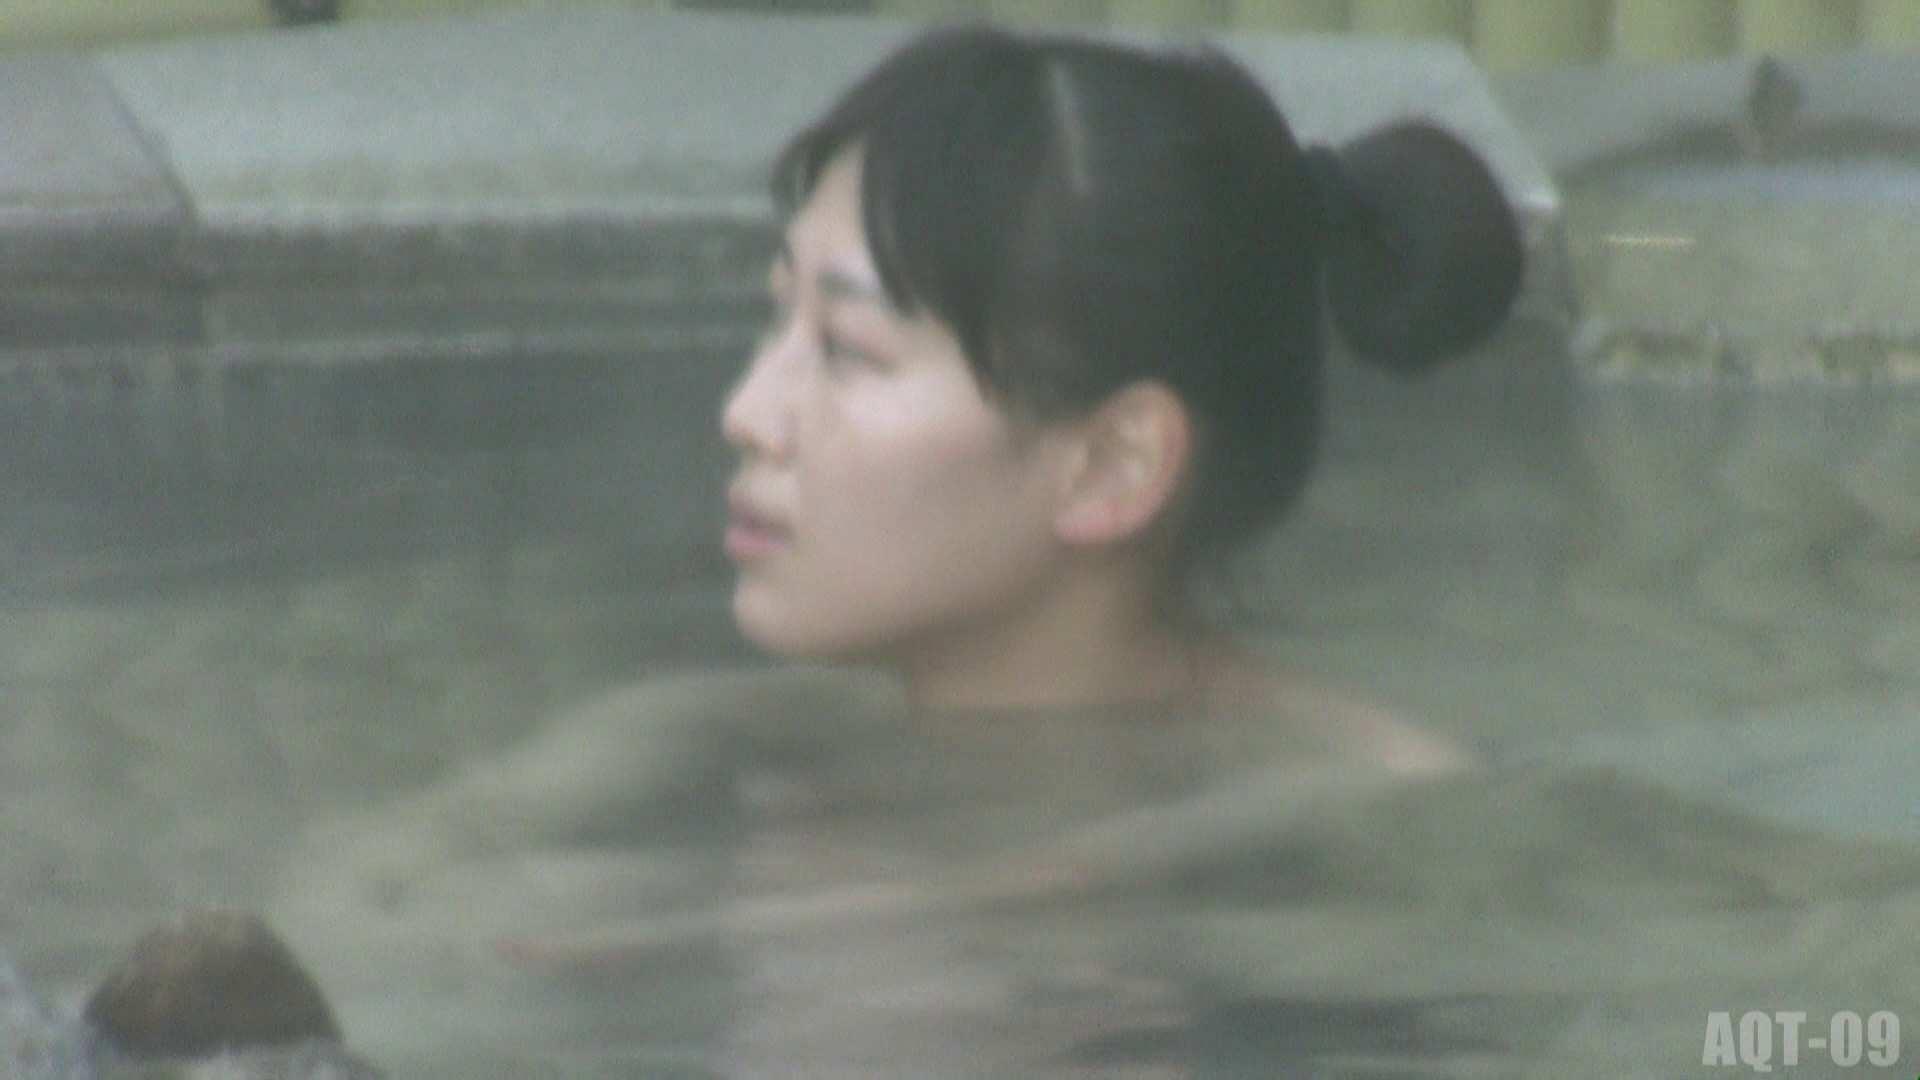 Aquaな露天風呂Vol.785 露天風呂編  110PIX 16